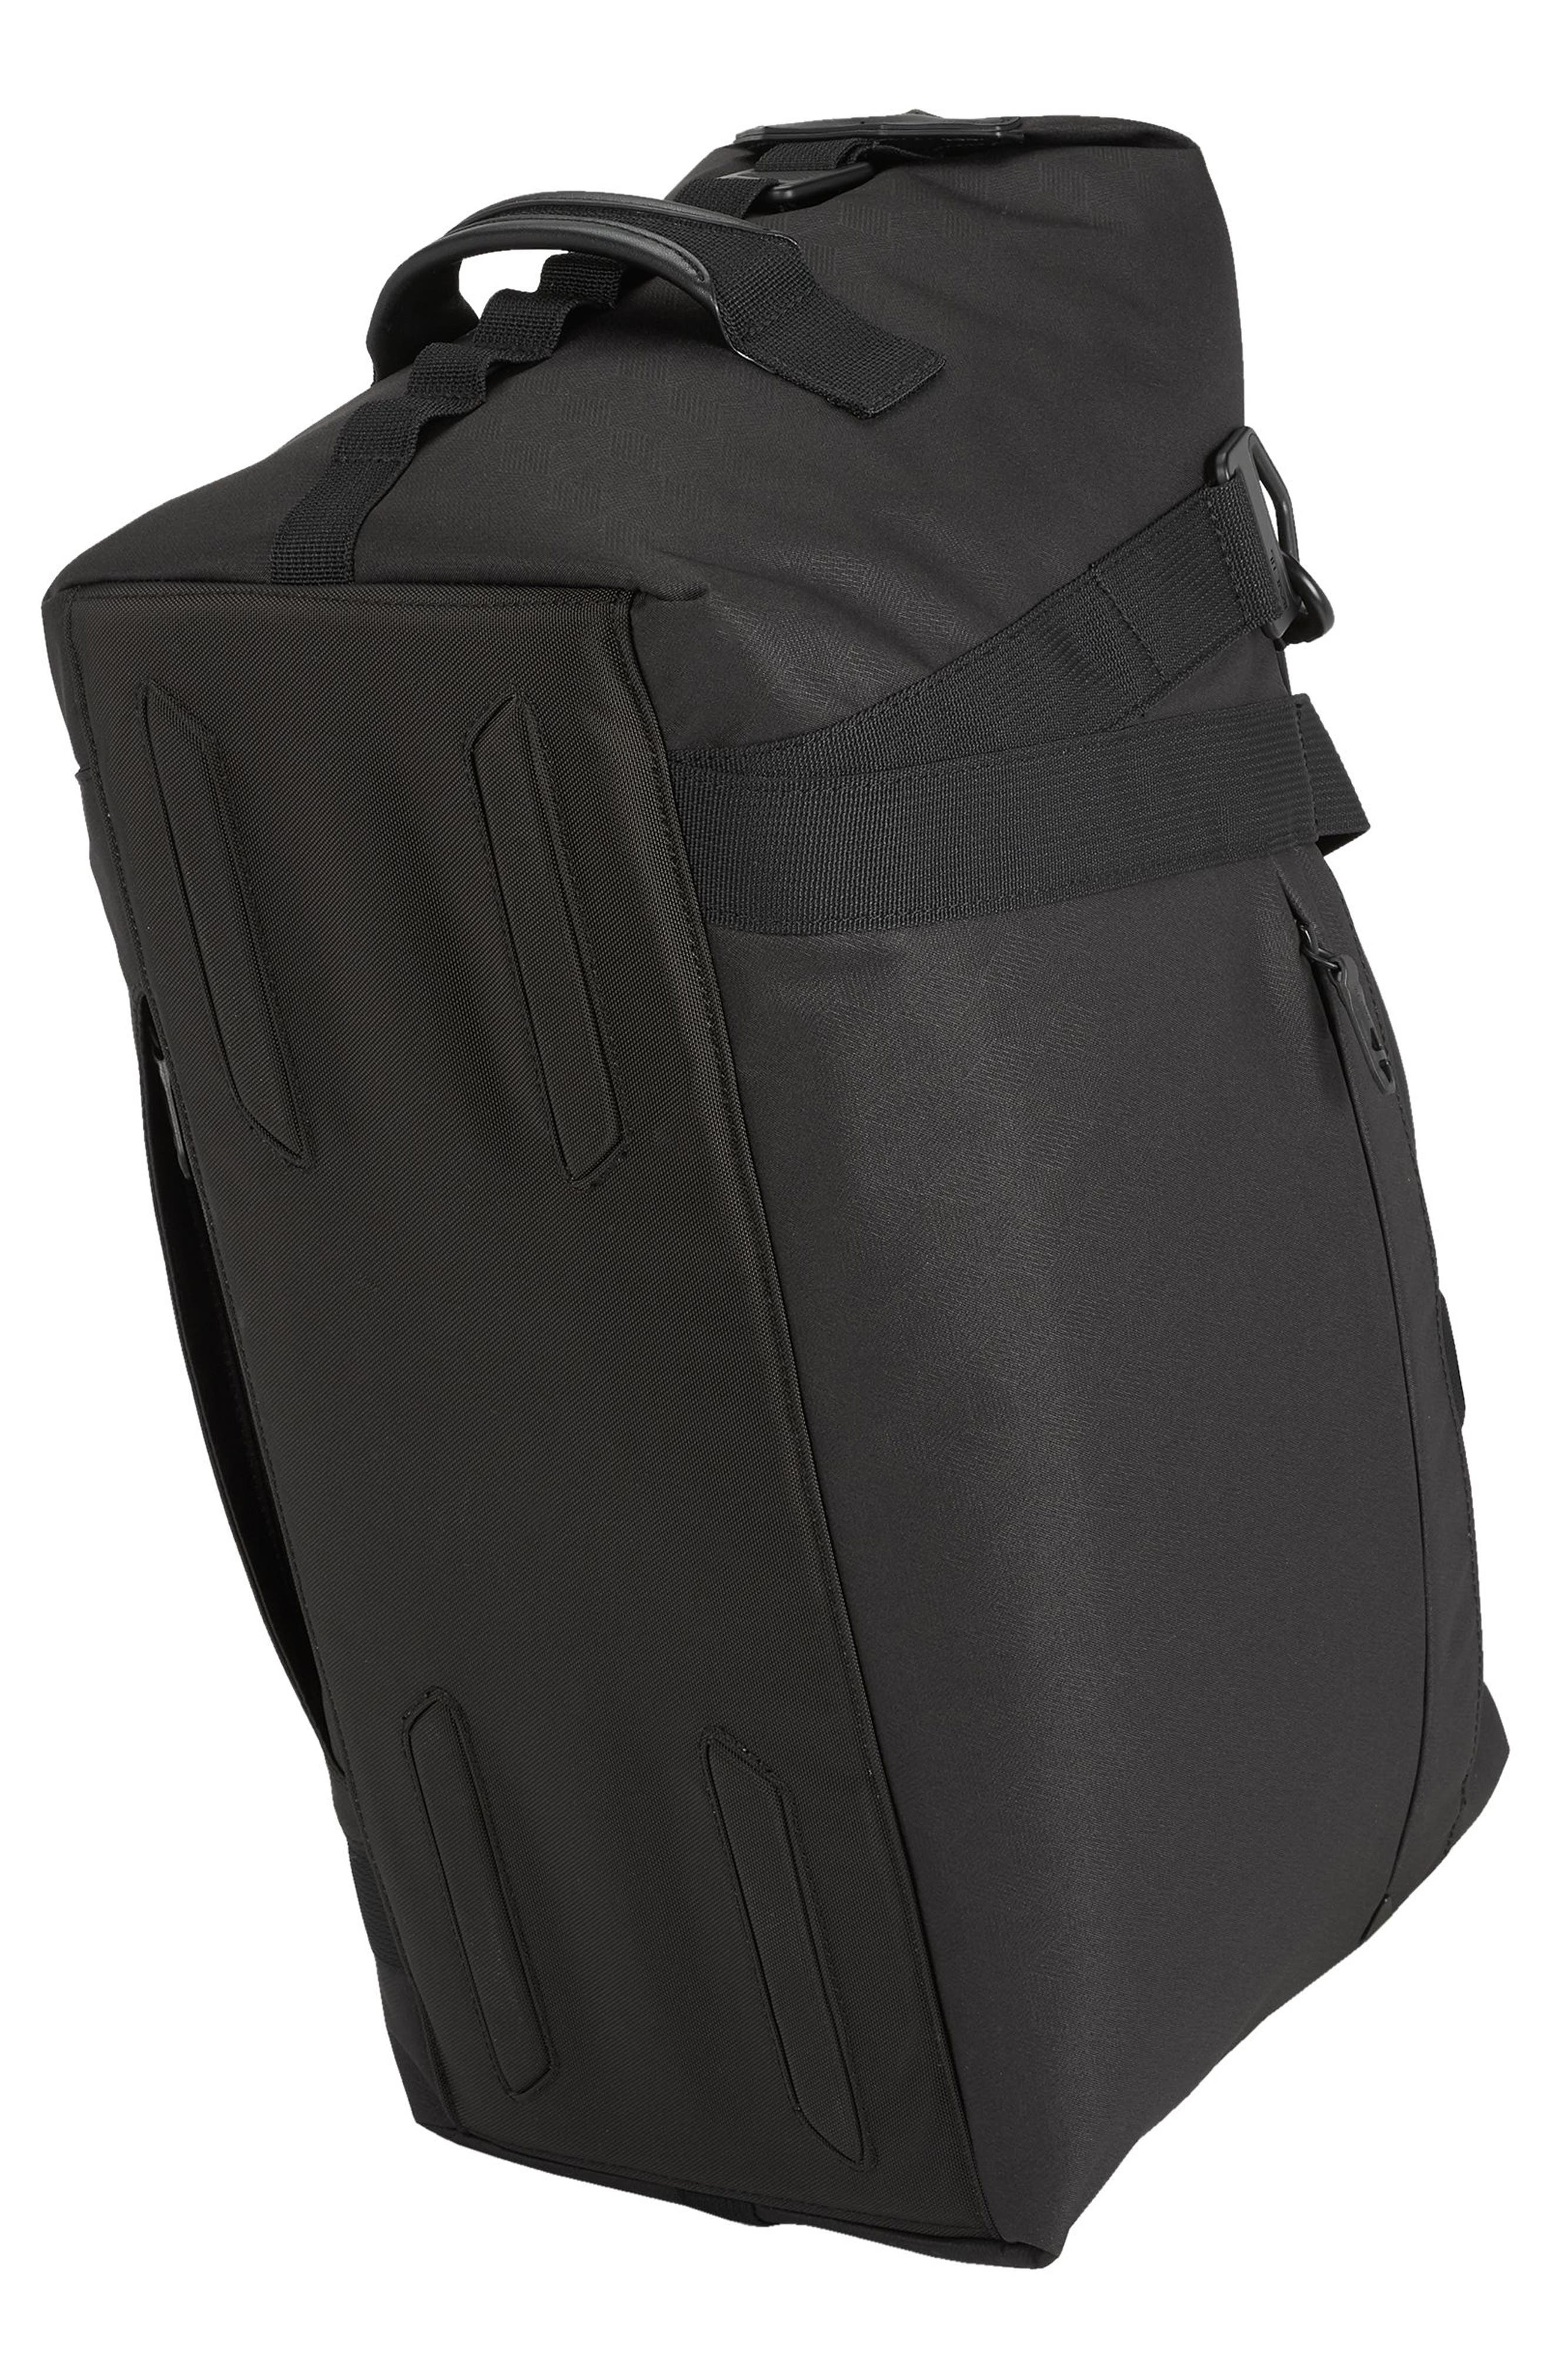 Sonoma Duffel Bag,                             Alternate thumbnail 4, color,                             Black